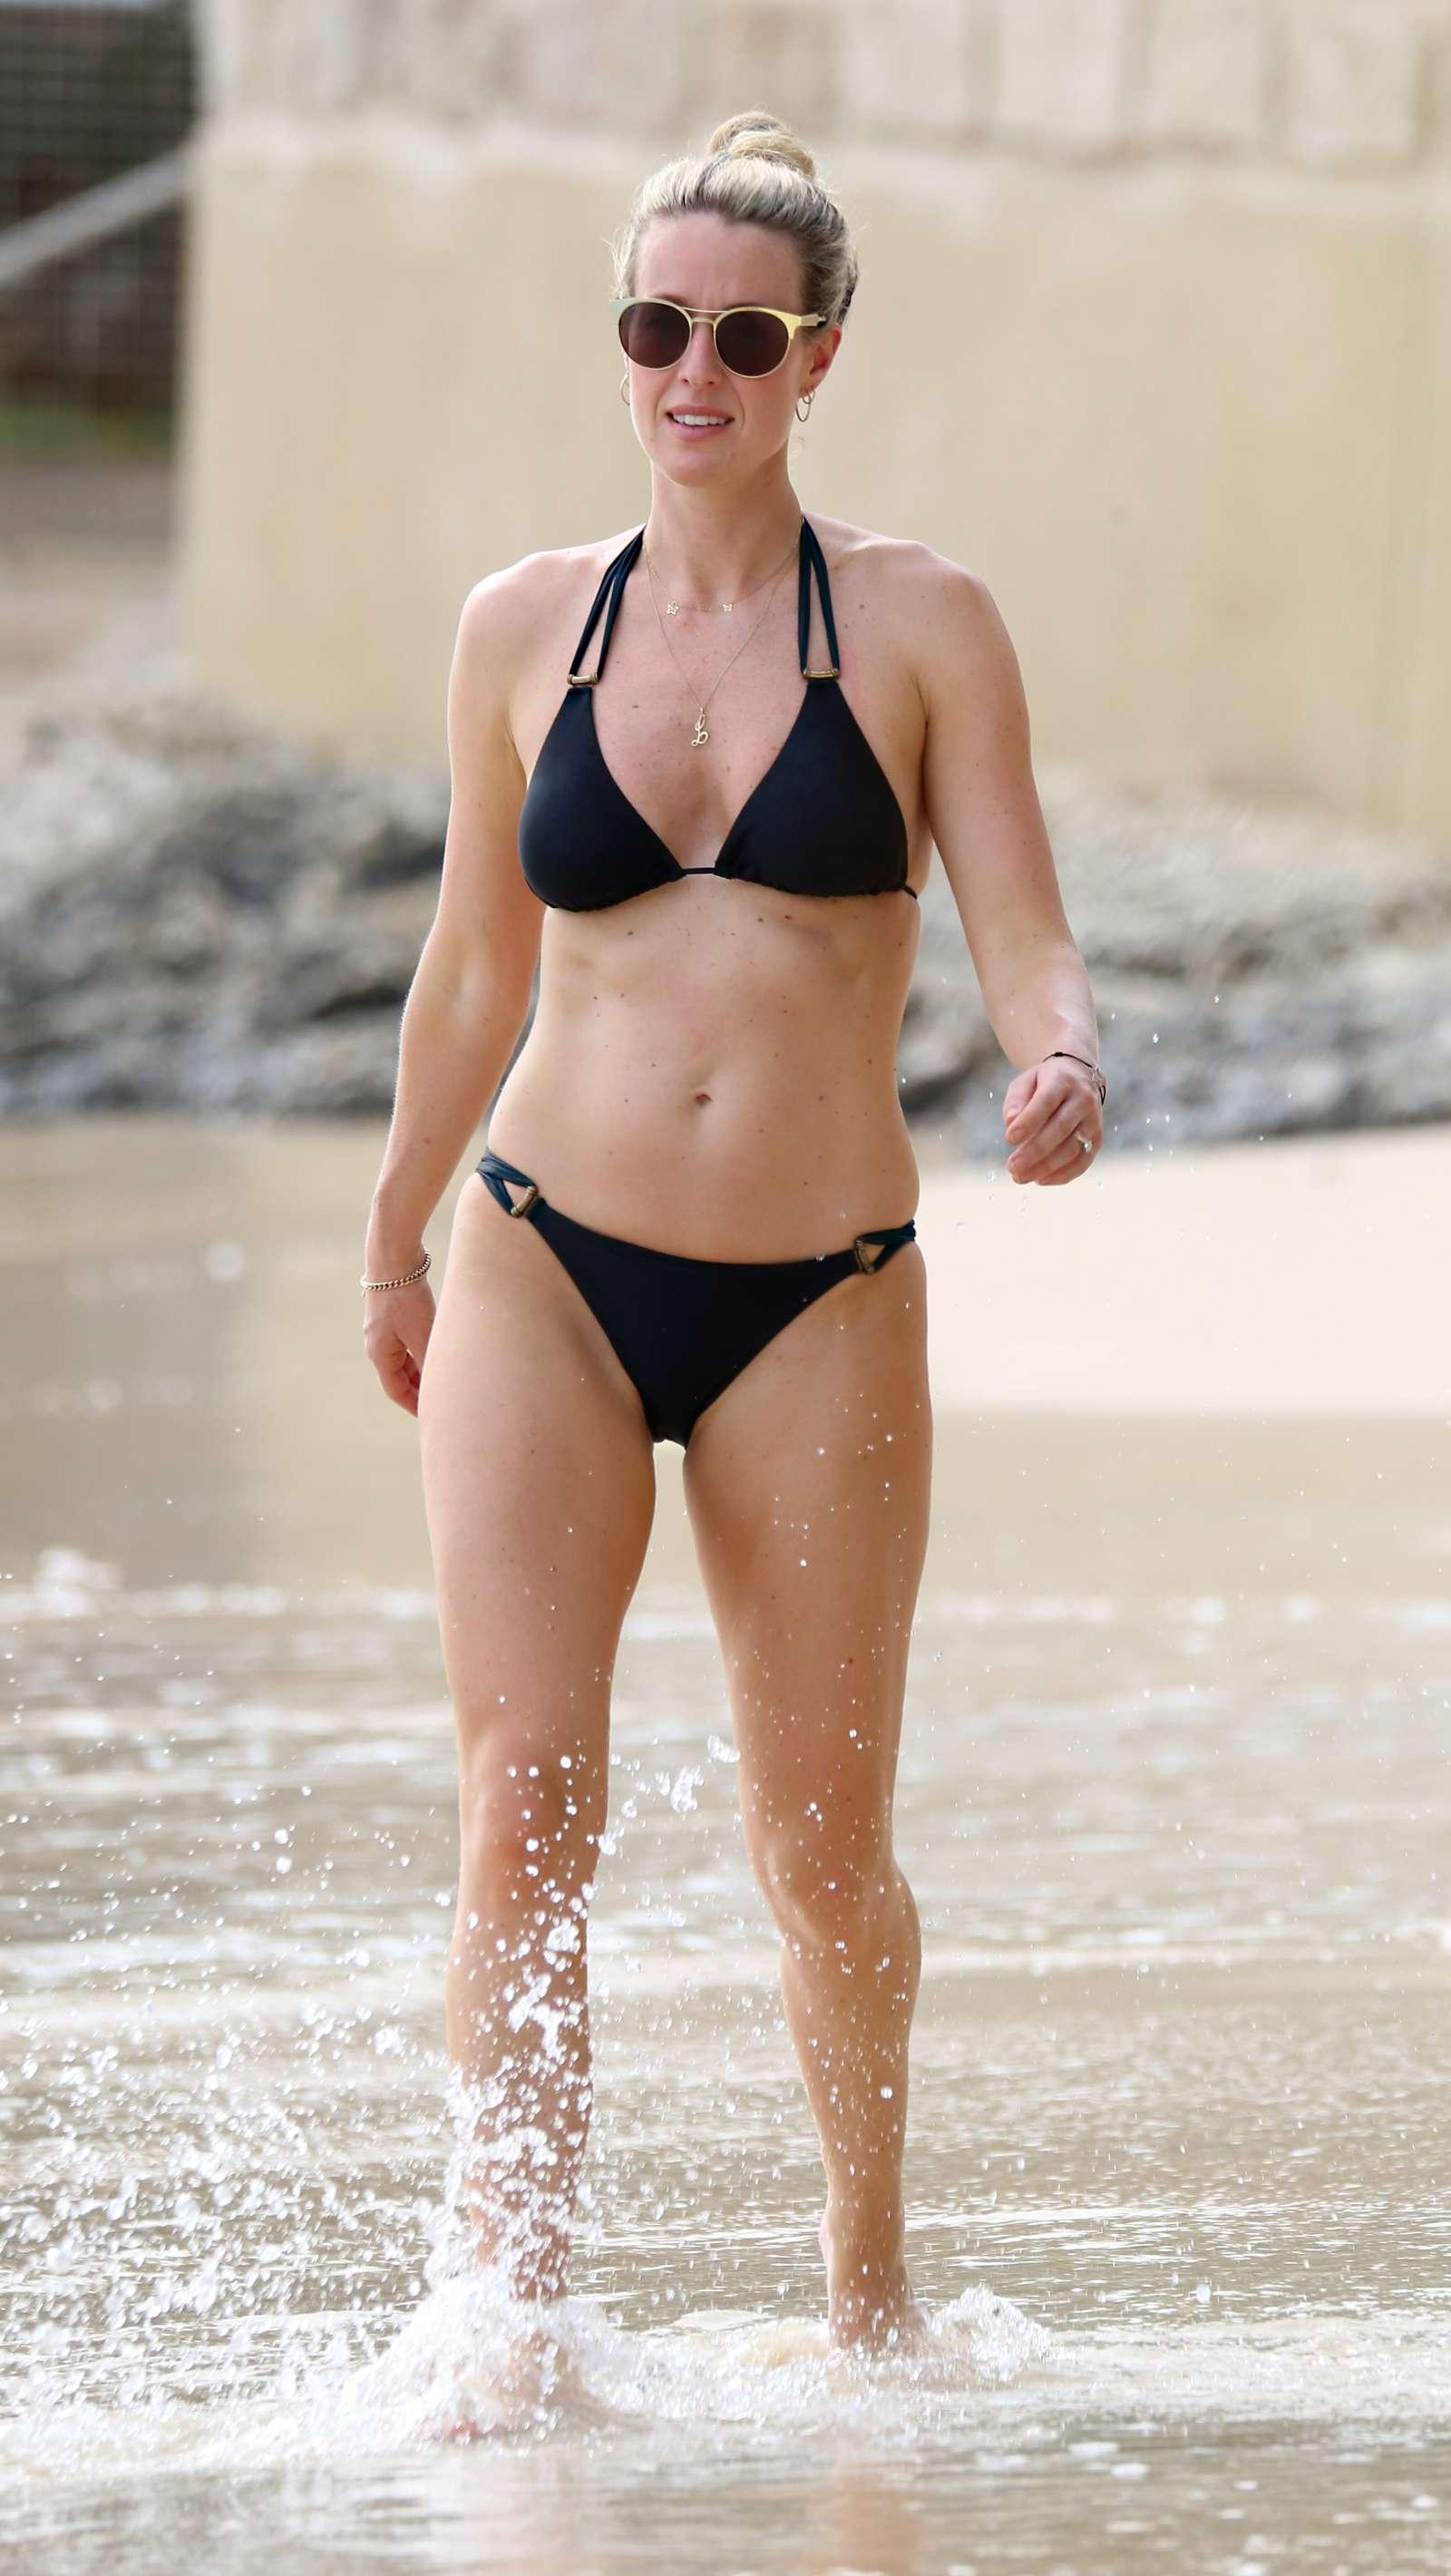 Lindsey Vonn Shows Off Her Stunning Olympic Skier Bikini Body